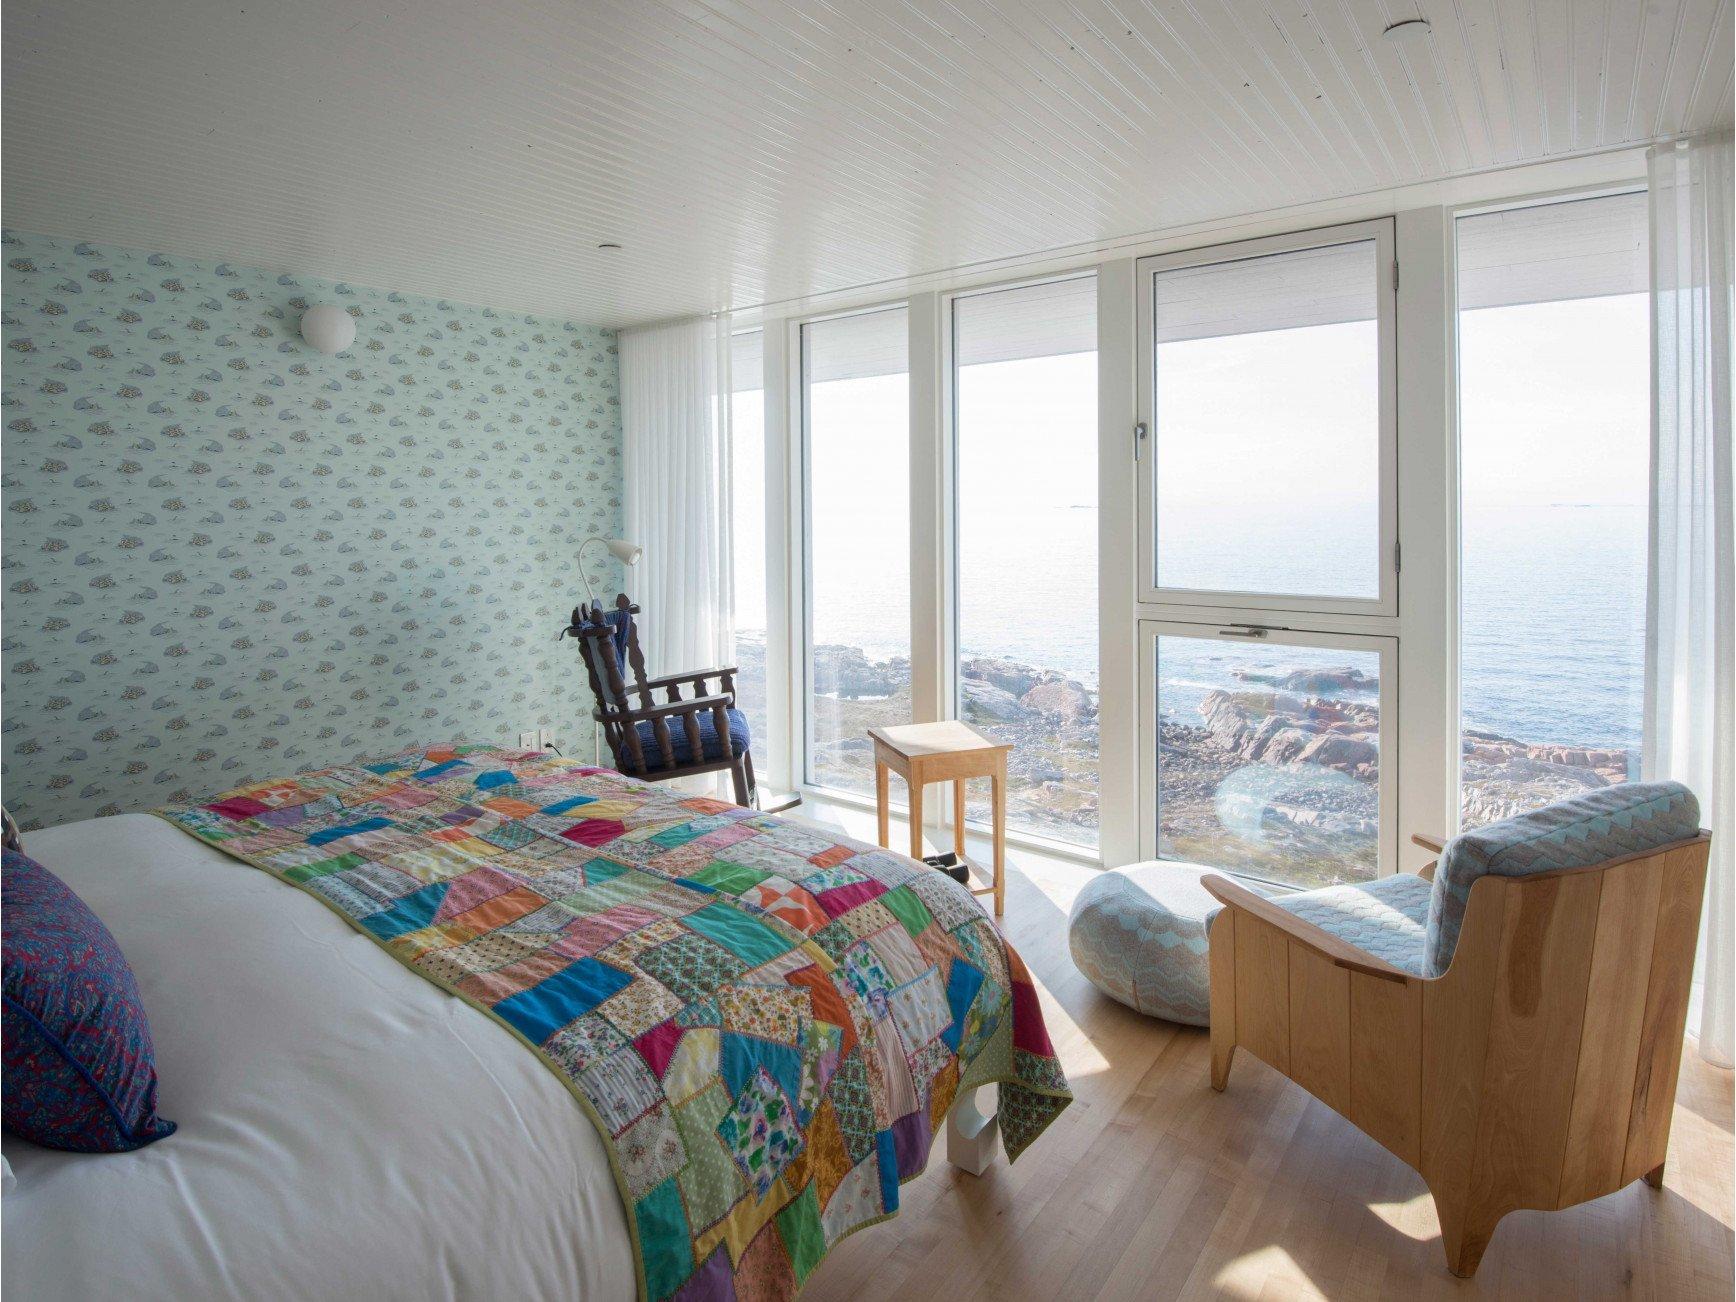 Fogo Island Inn καναδάς δωμάτιο με θέα στον ωκεανό